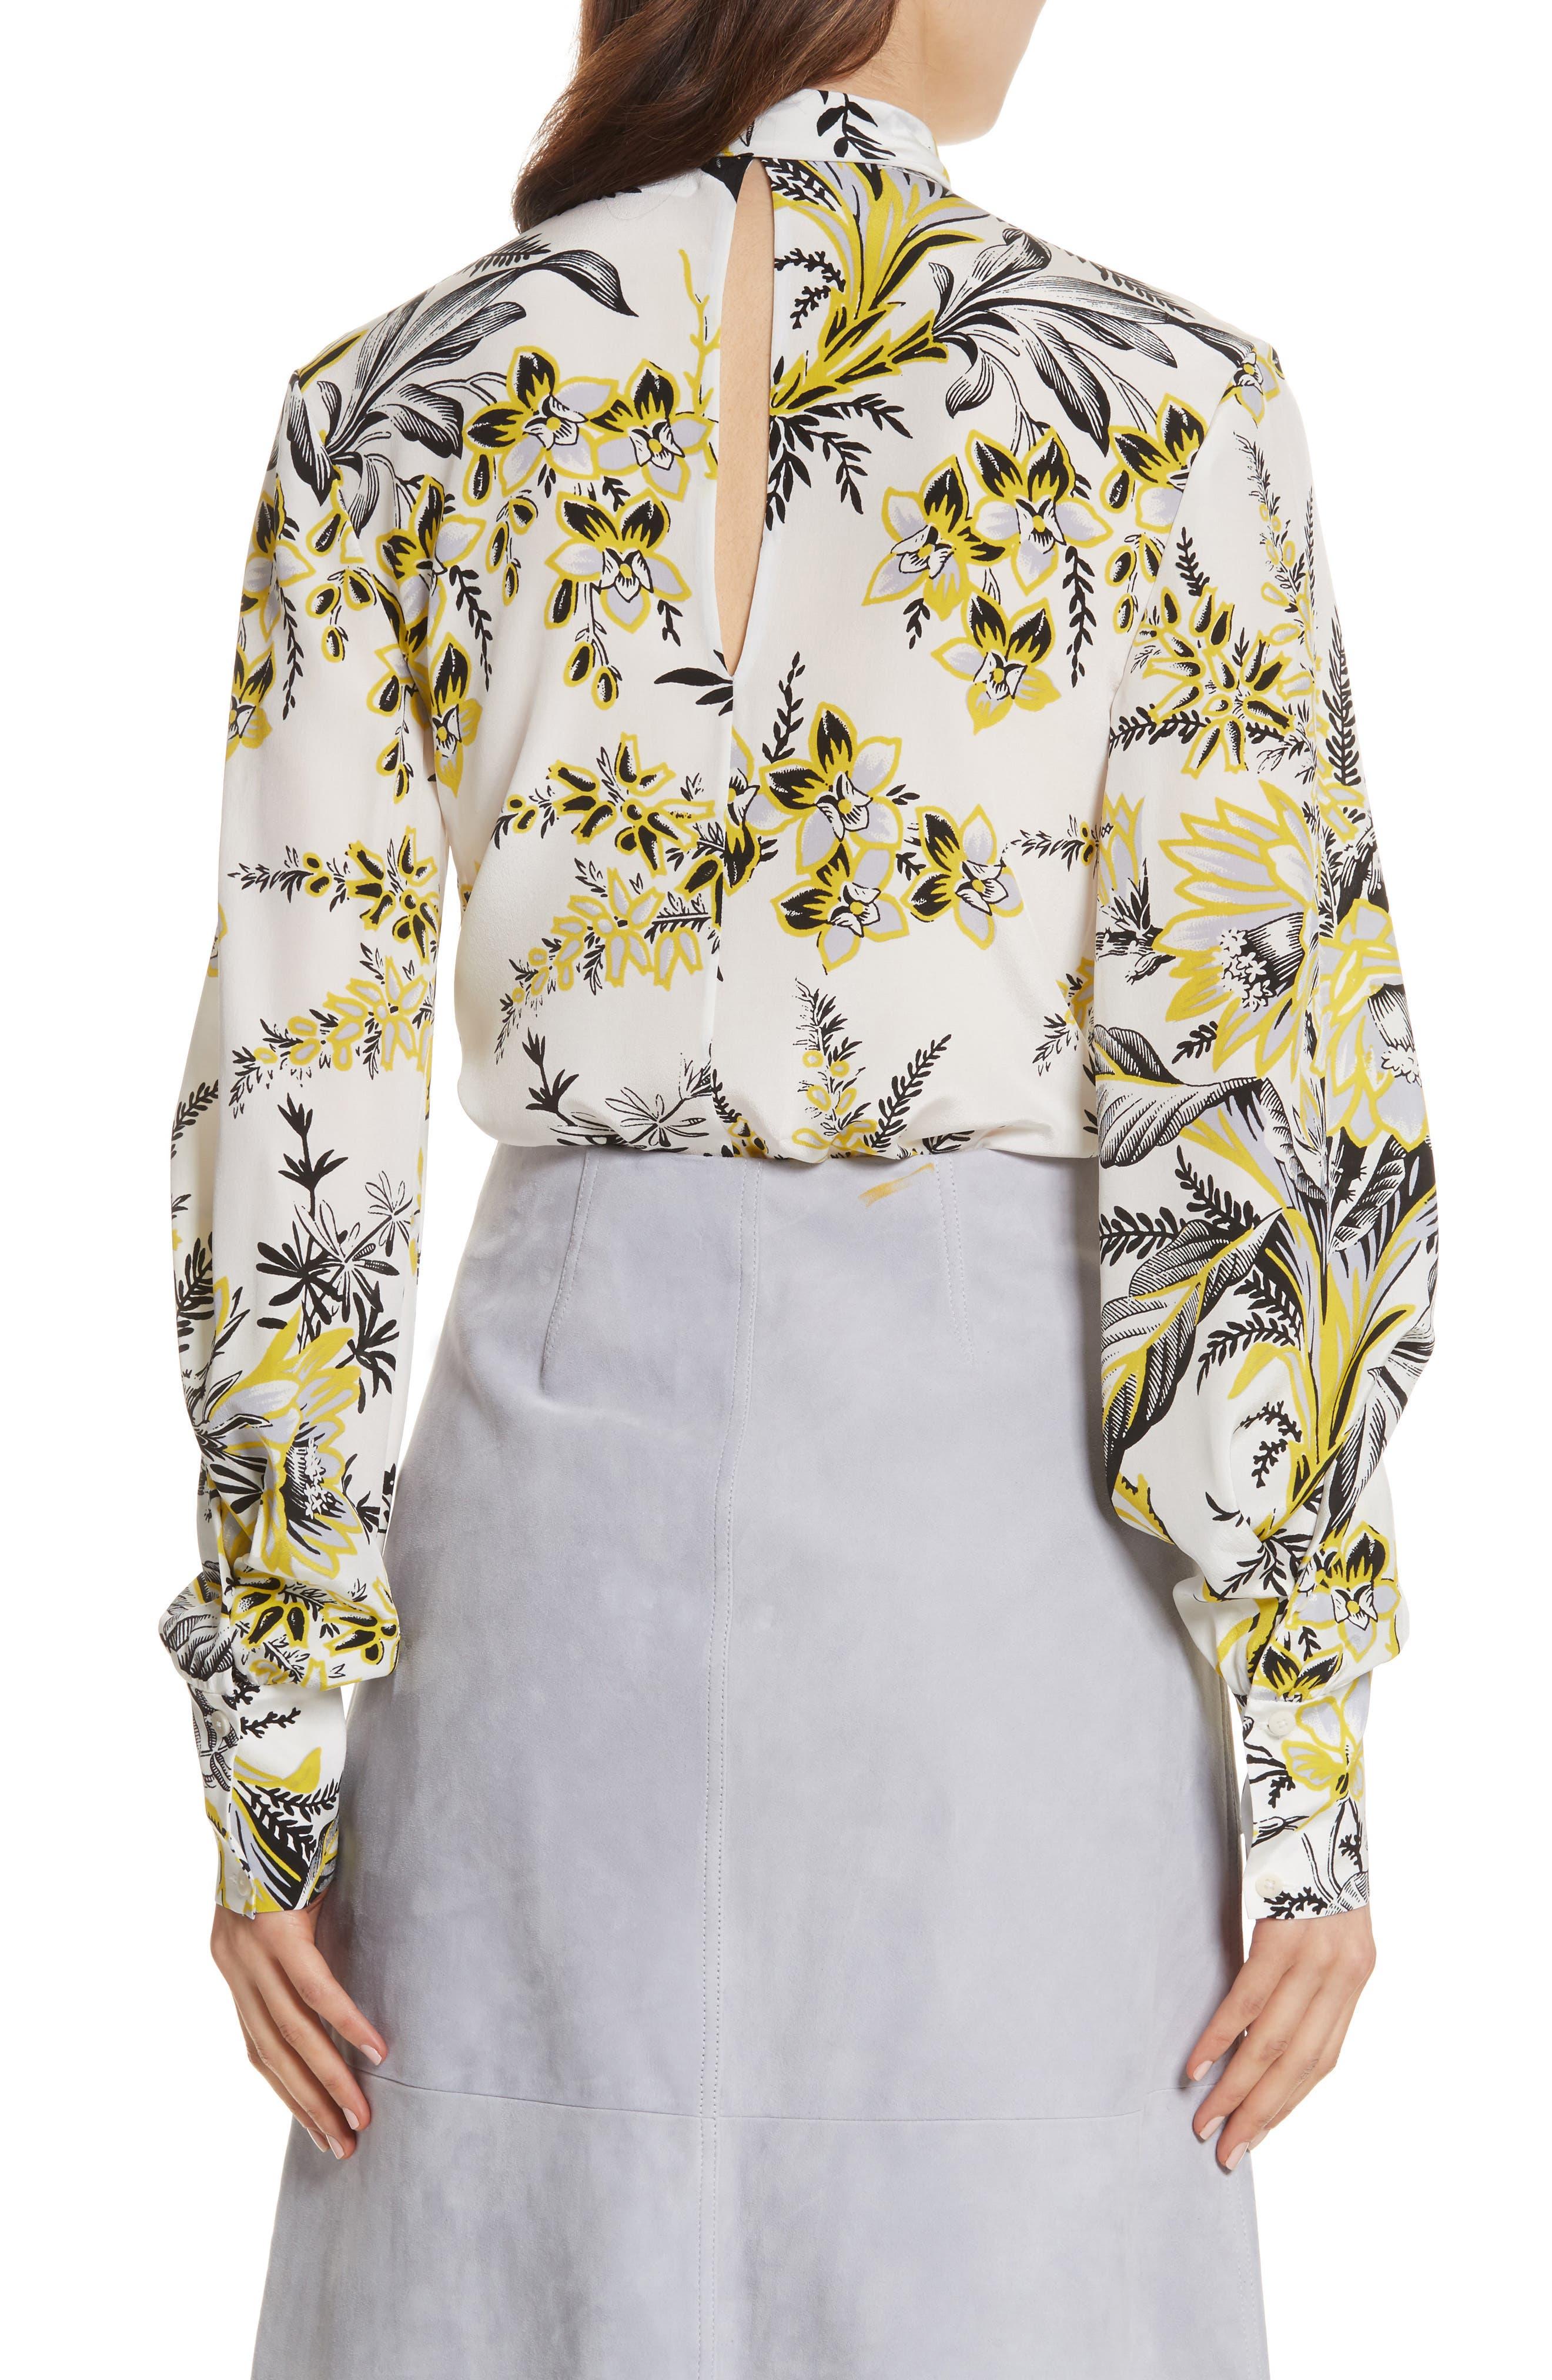 Diane von Furstenberg Tie Neck Silk Blouse,                             Alternate thumbnail 2, color,                             189